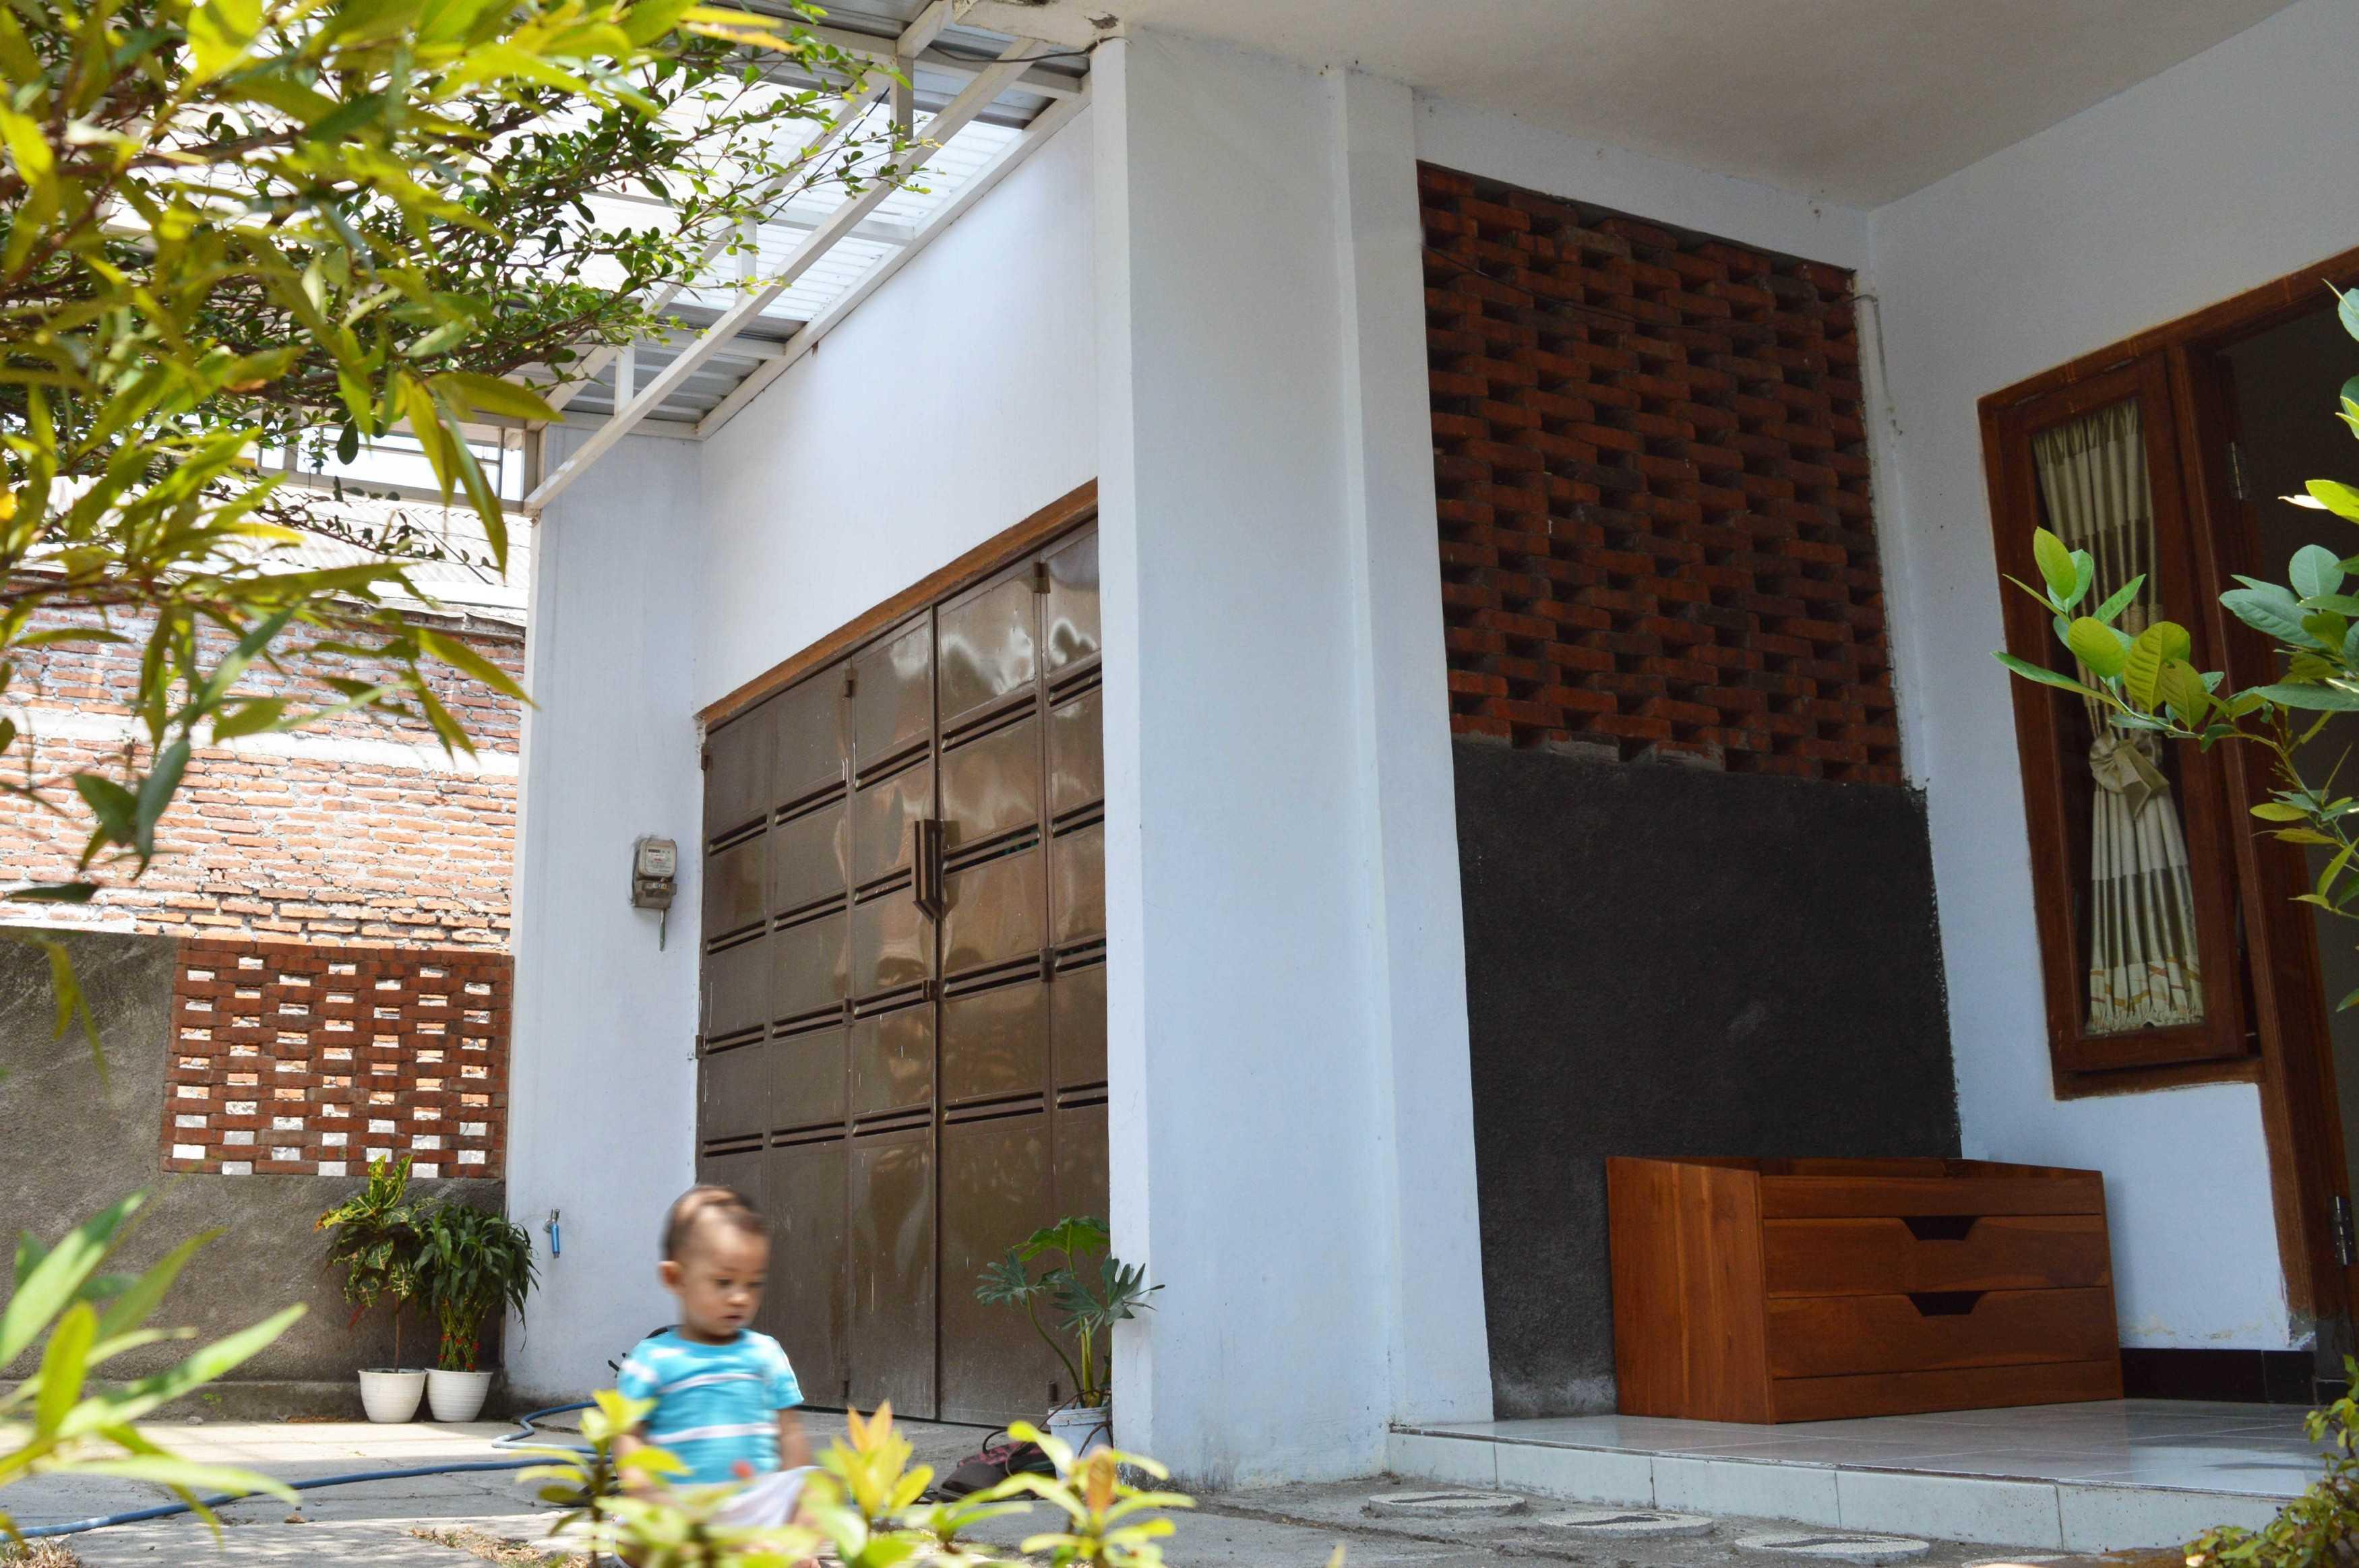 Epicnesia_Architect Rumah Am Plemahan, Kediri, Jawa Timur, Indonesia Plemahan, Kediri, Jawa Timur, Indonesia Aditya-Yuni-Prasetya-Rumah-Am Contemporary  68056